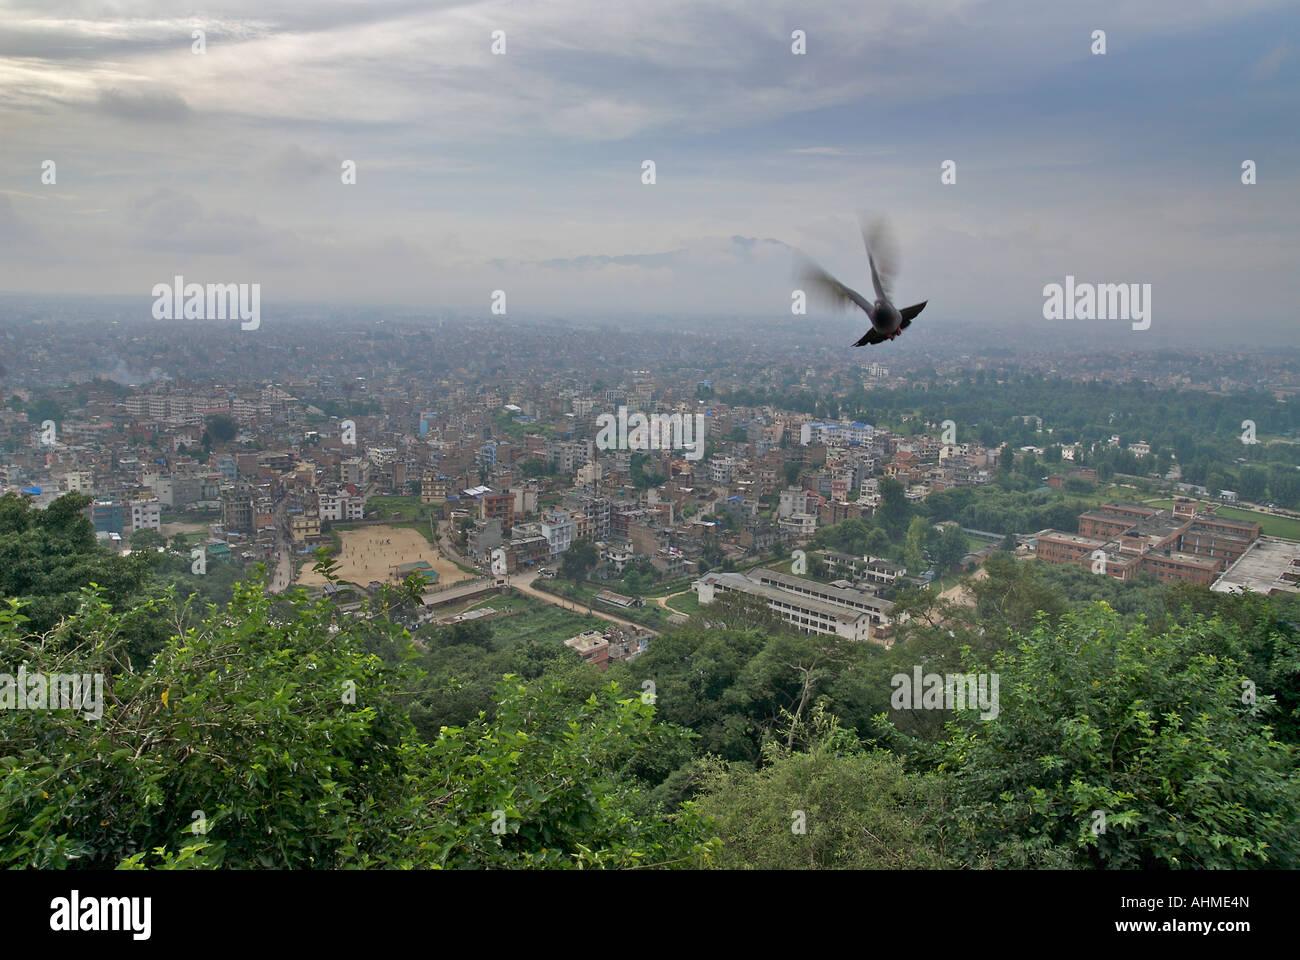 View of Kathmandhu from the temple at Swayambhunath Kathmandu Nepal Flying Pigeon - Stock Image